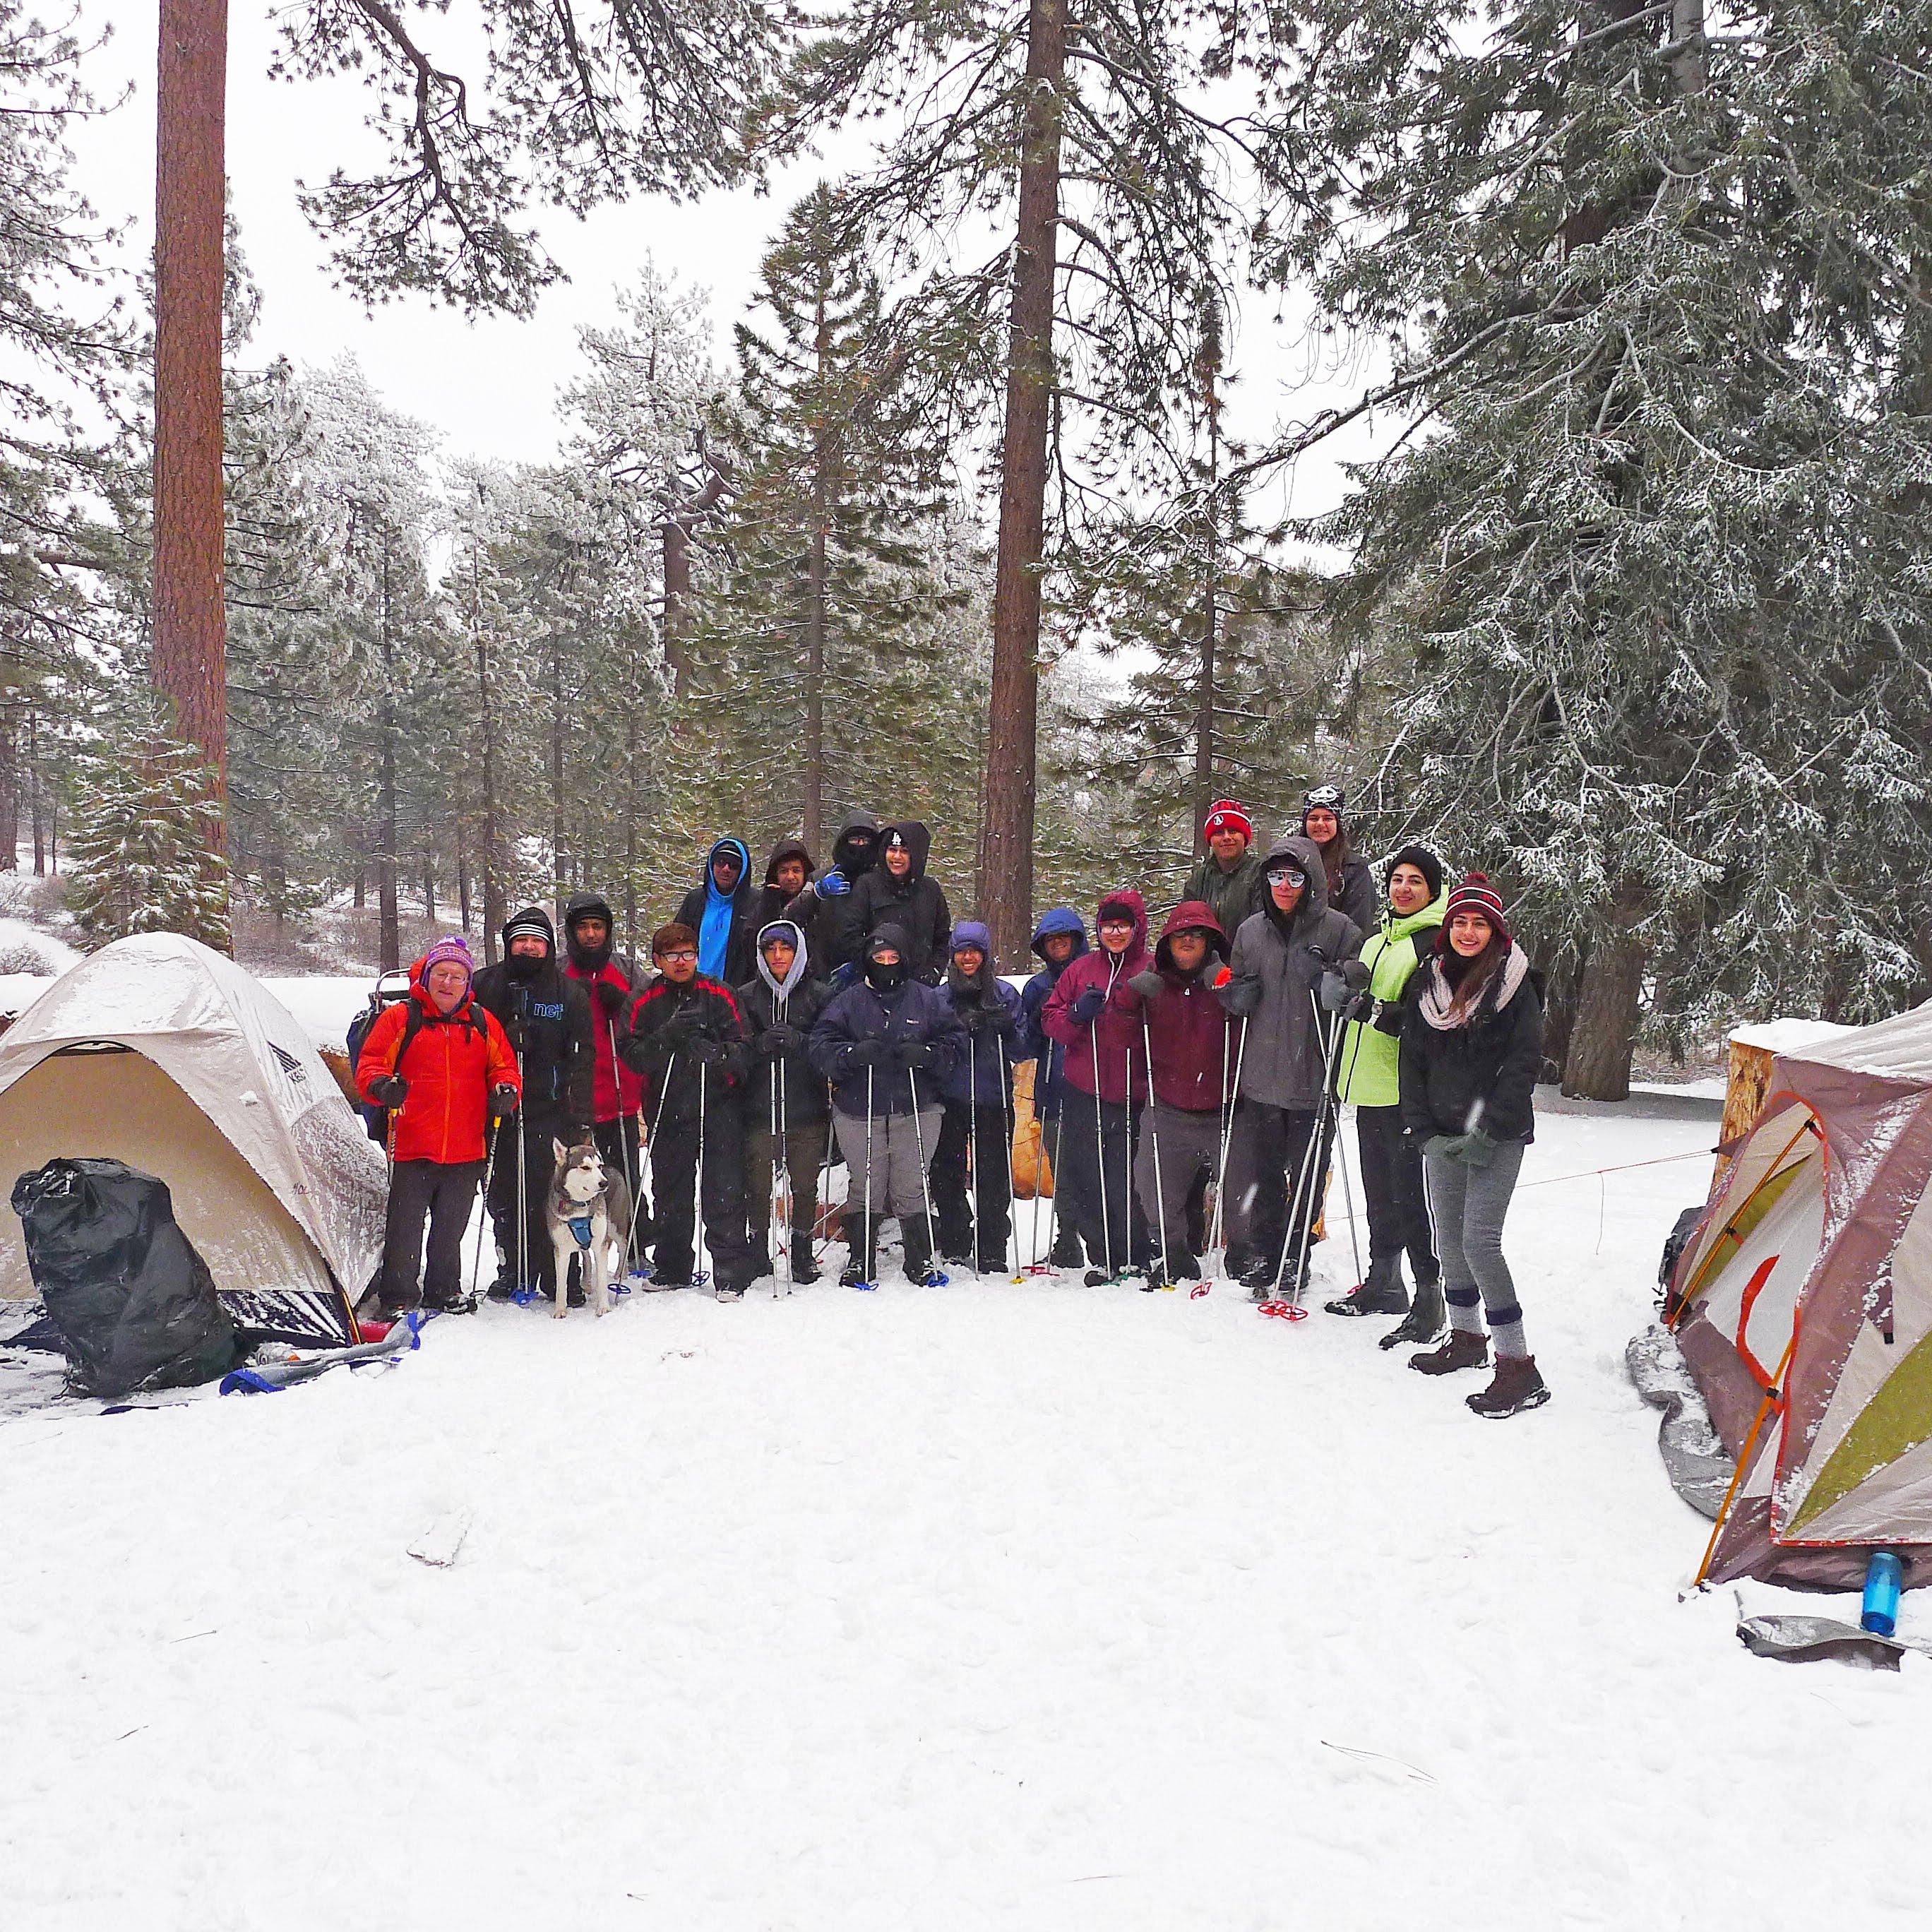 Venturers @ Mt Pinos #1 '18